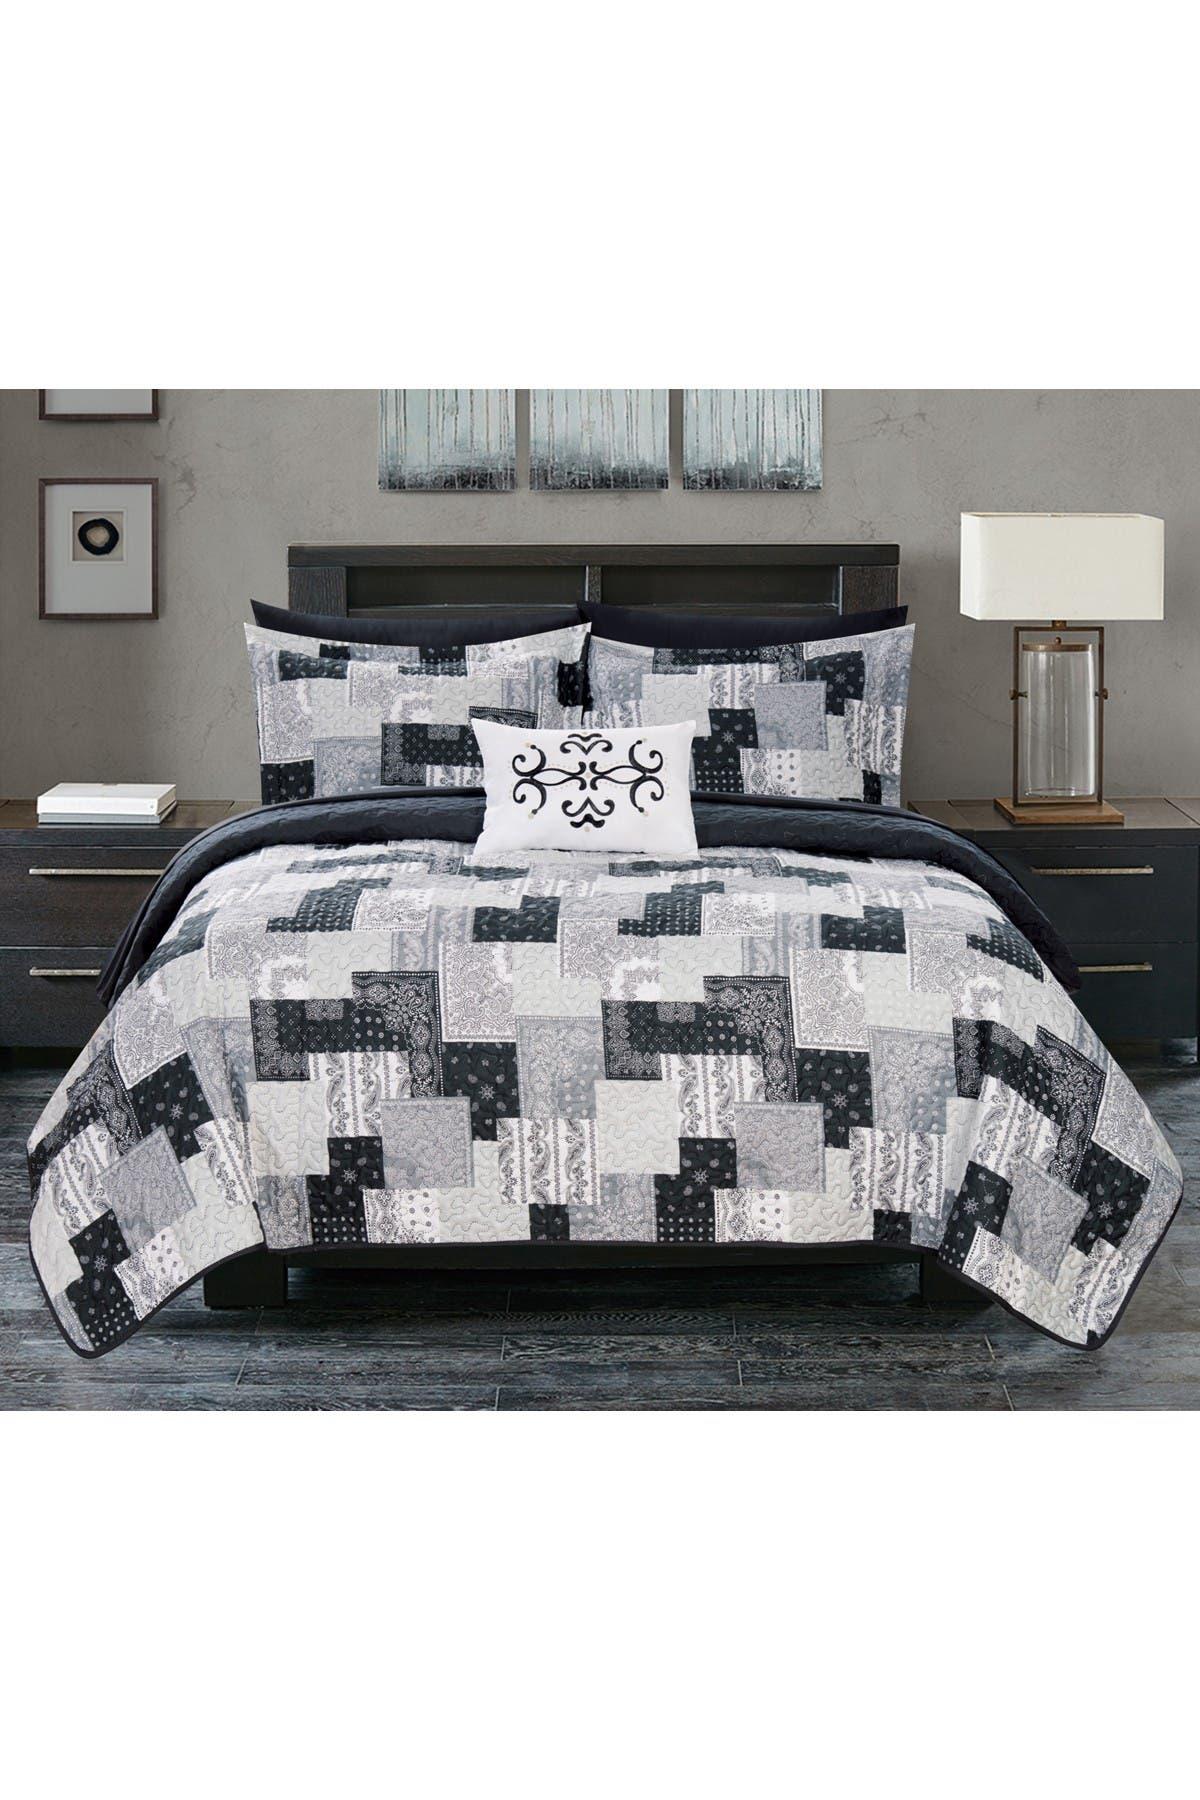 Image of Chic Home Bedding King Rafaela Reversible Bohemian Paisley Quilt Set - Black